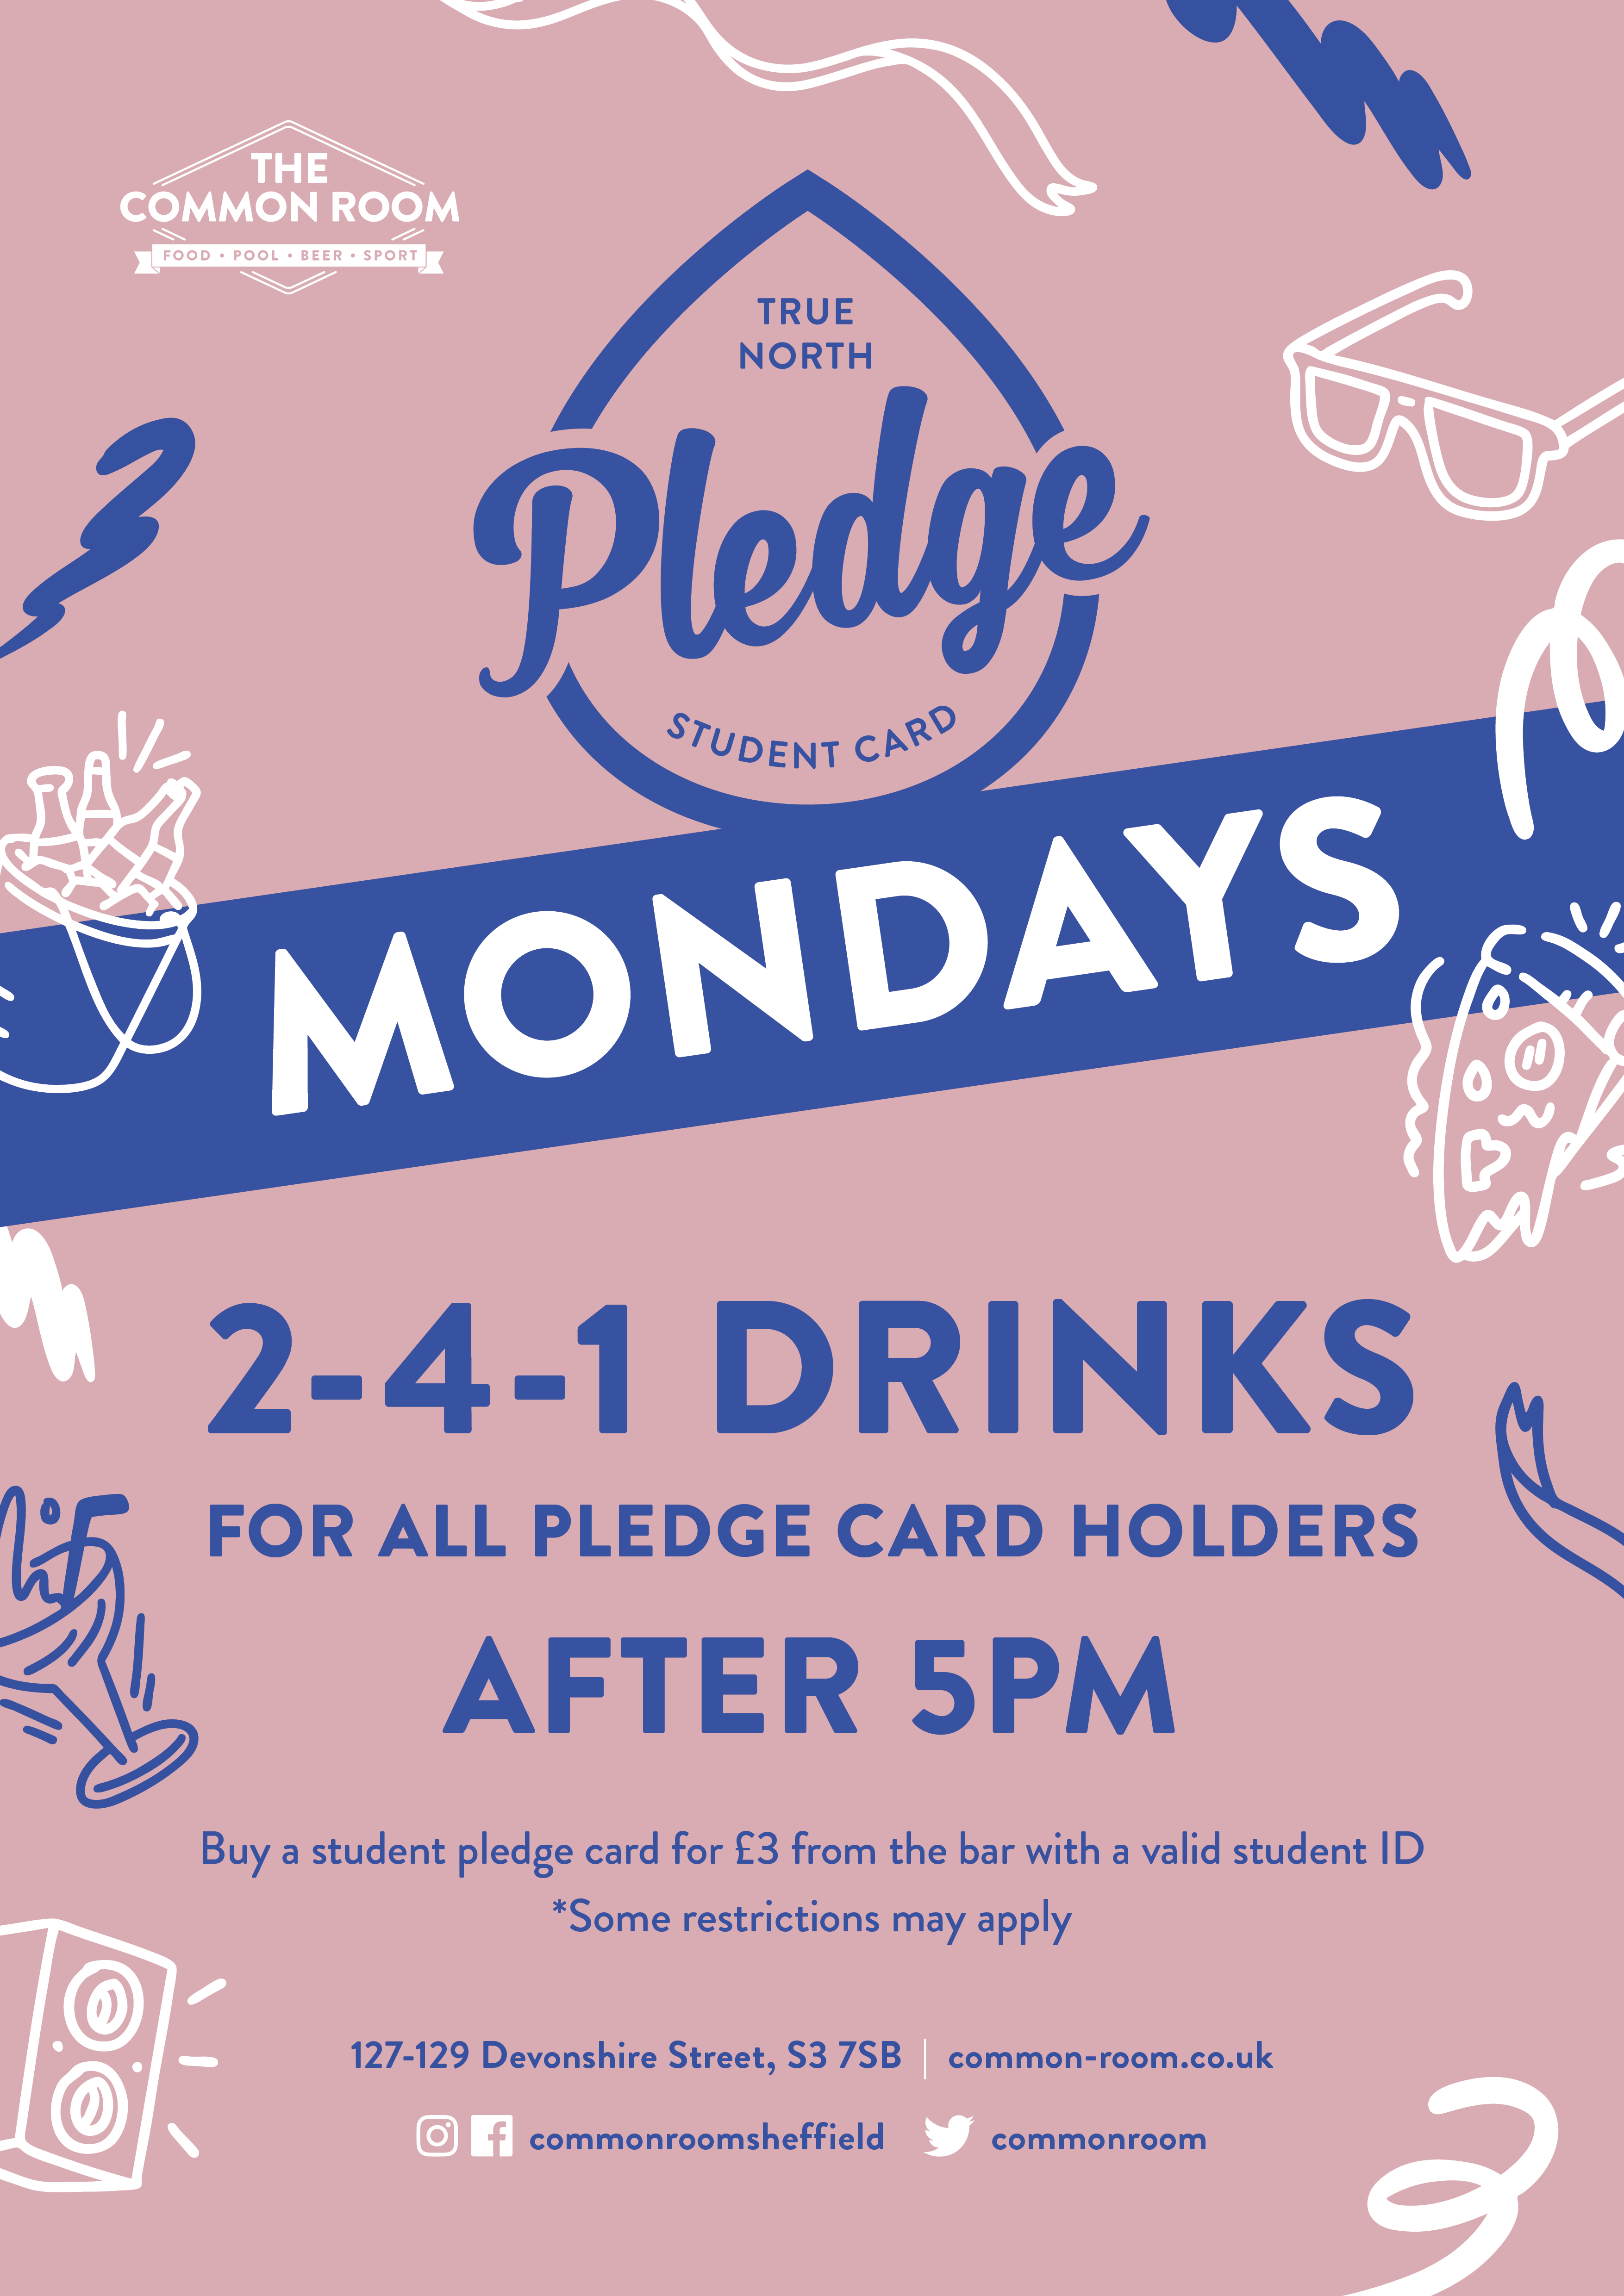 Pledge Mondays